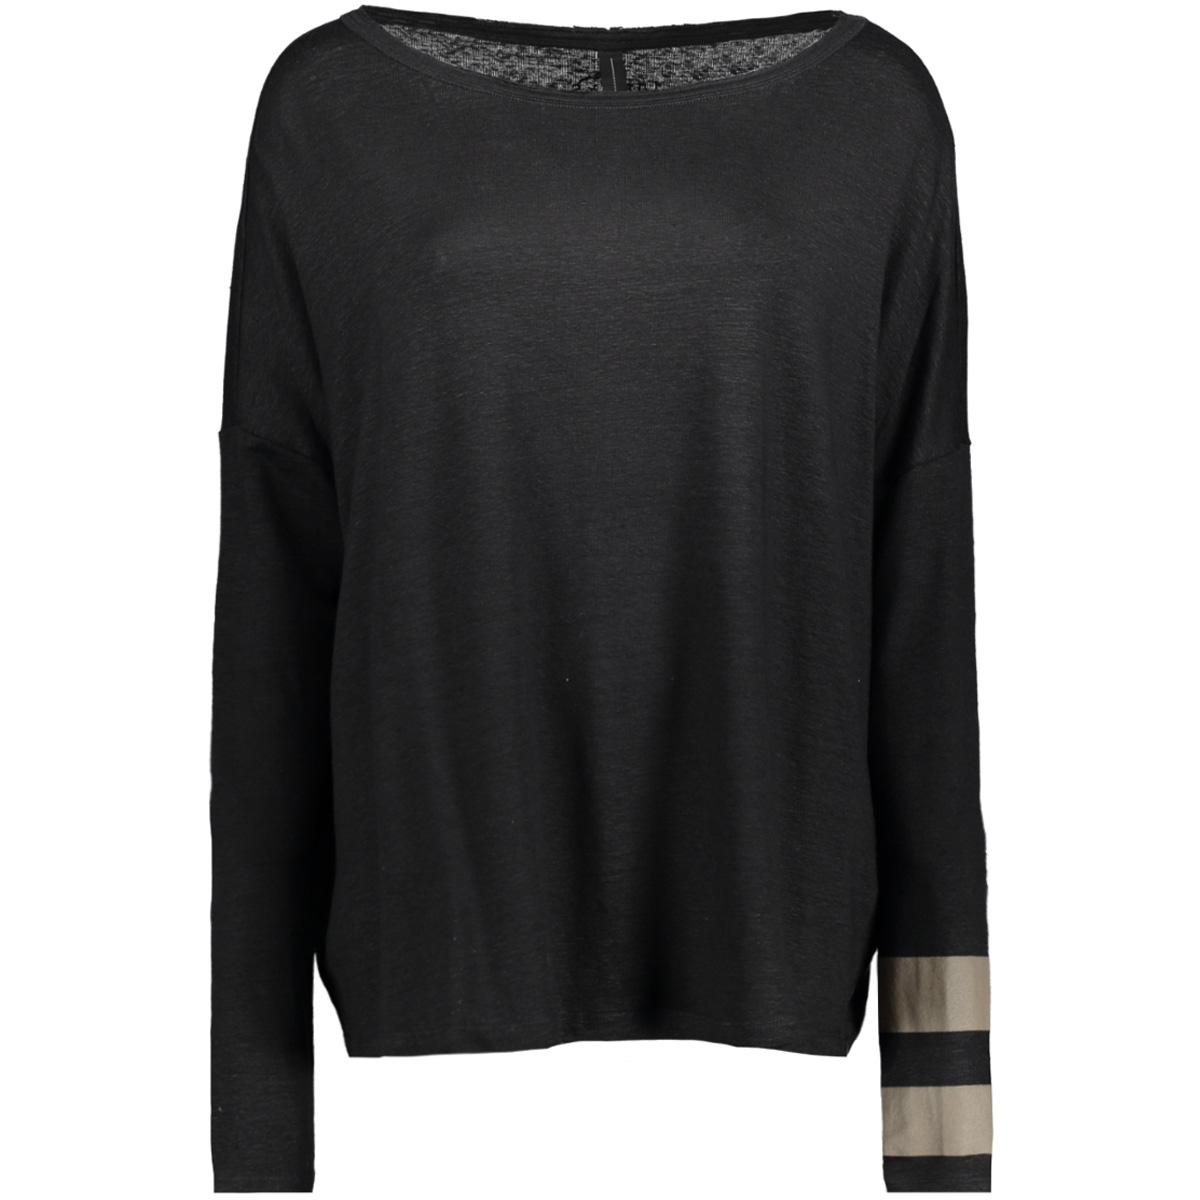 20-772-7103 10 days t-shirt black